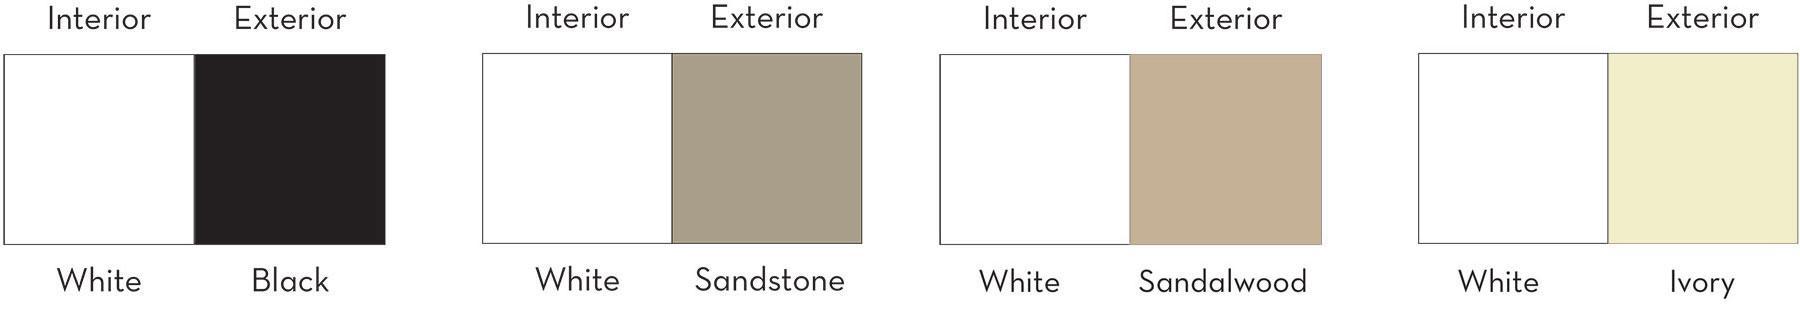 Exterior_Capstock_colour_WC251